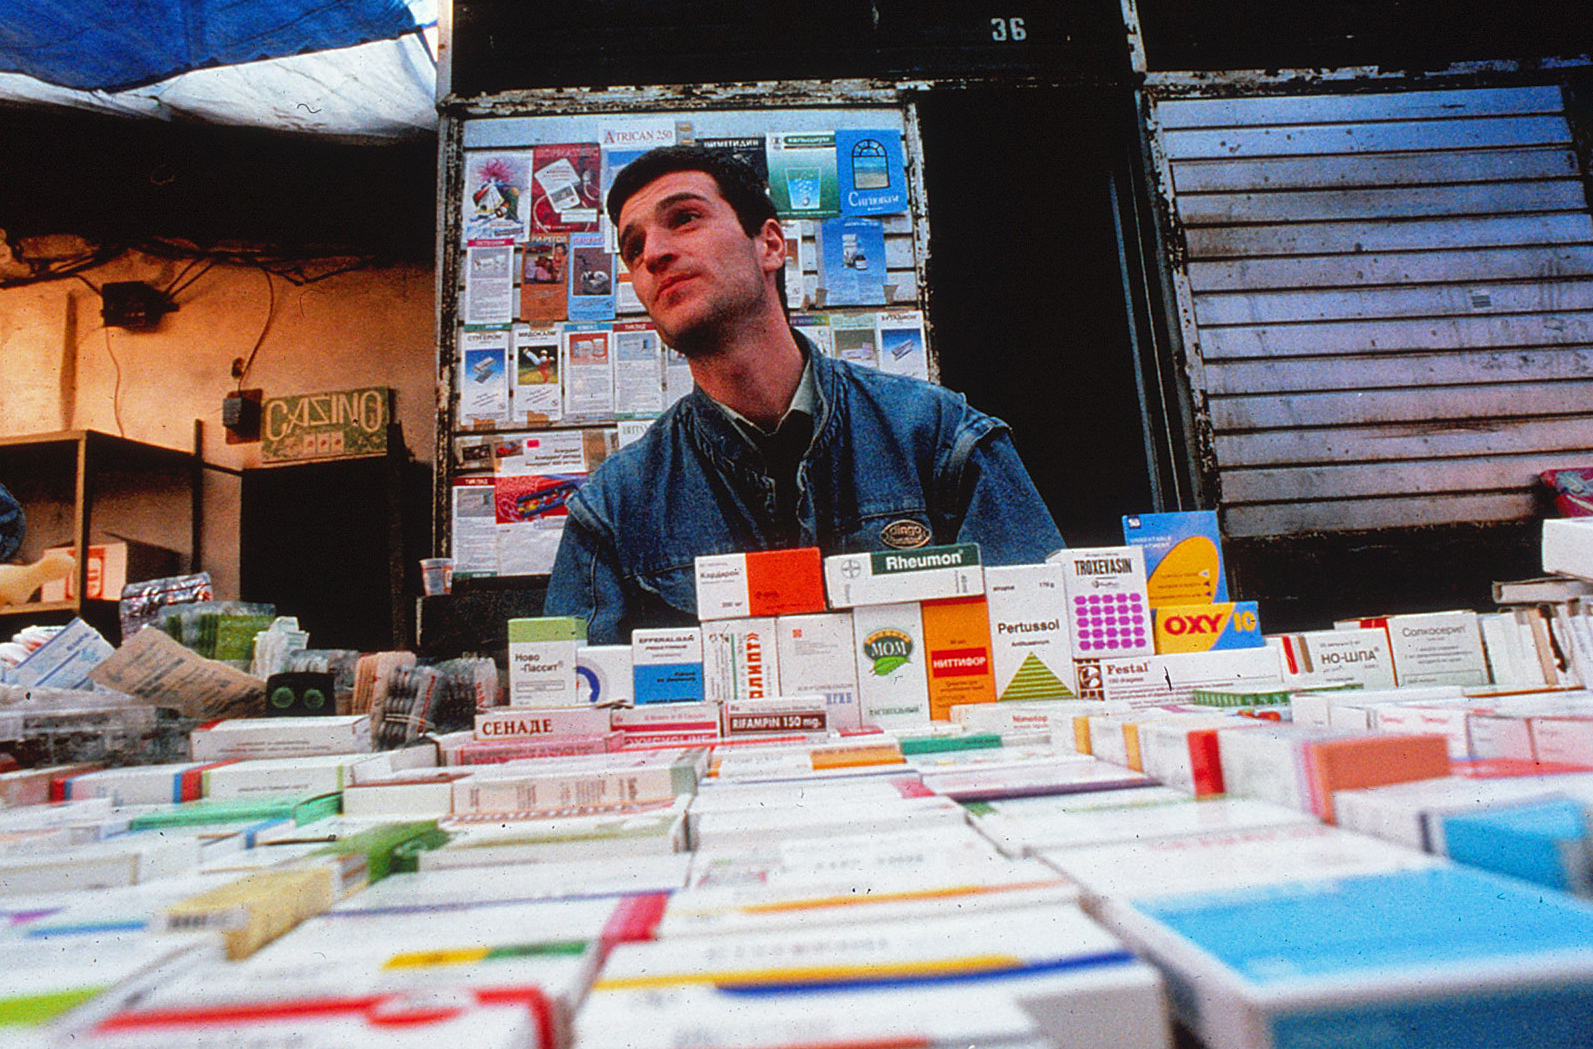 Blackmarket-pharma-in-Siberia--Florescu-(deleted-4db488fb-99e125-89ff9c69).jpg